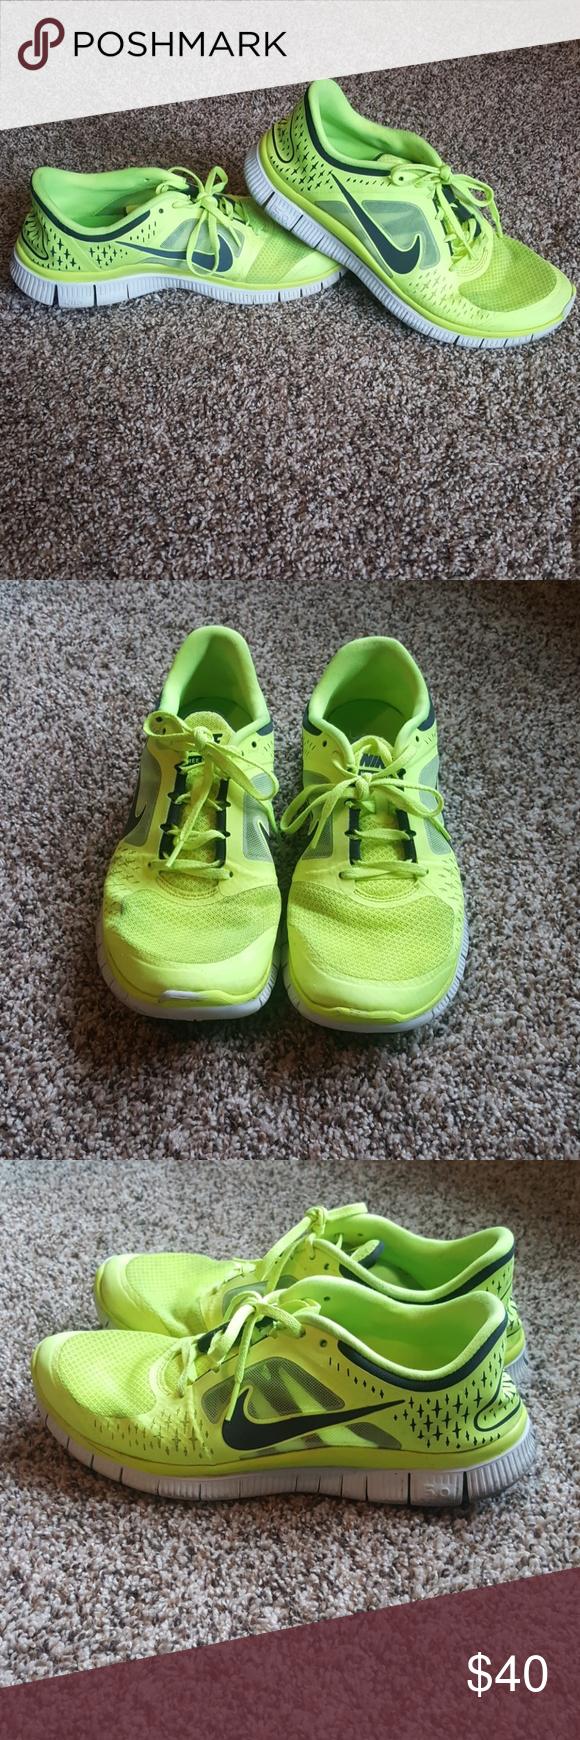 Men's Nike Free Run 3 Neon running shoe Men's size 11 Nike